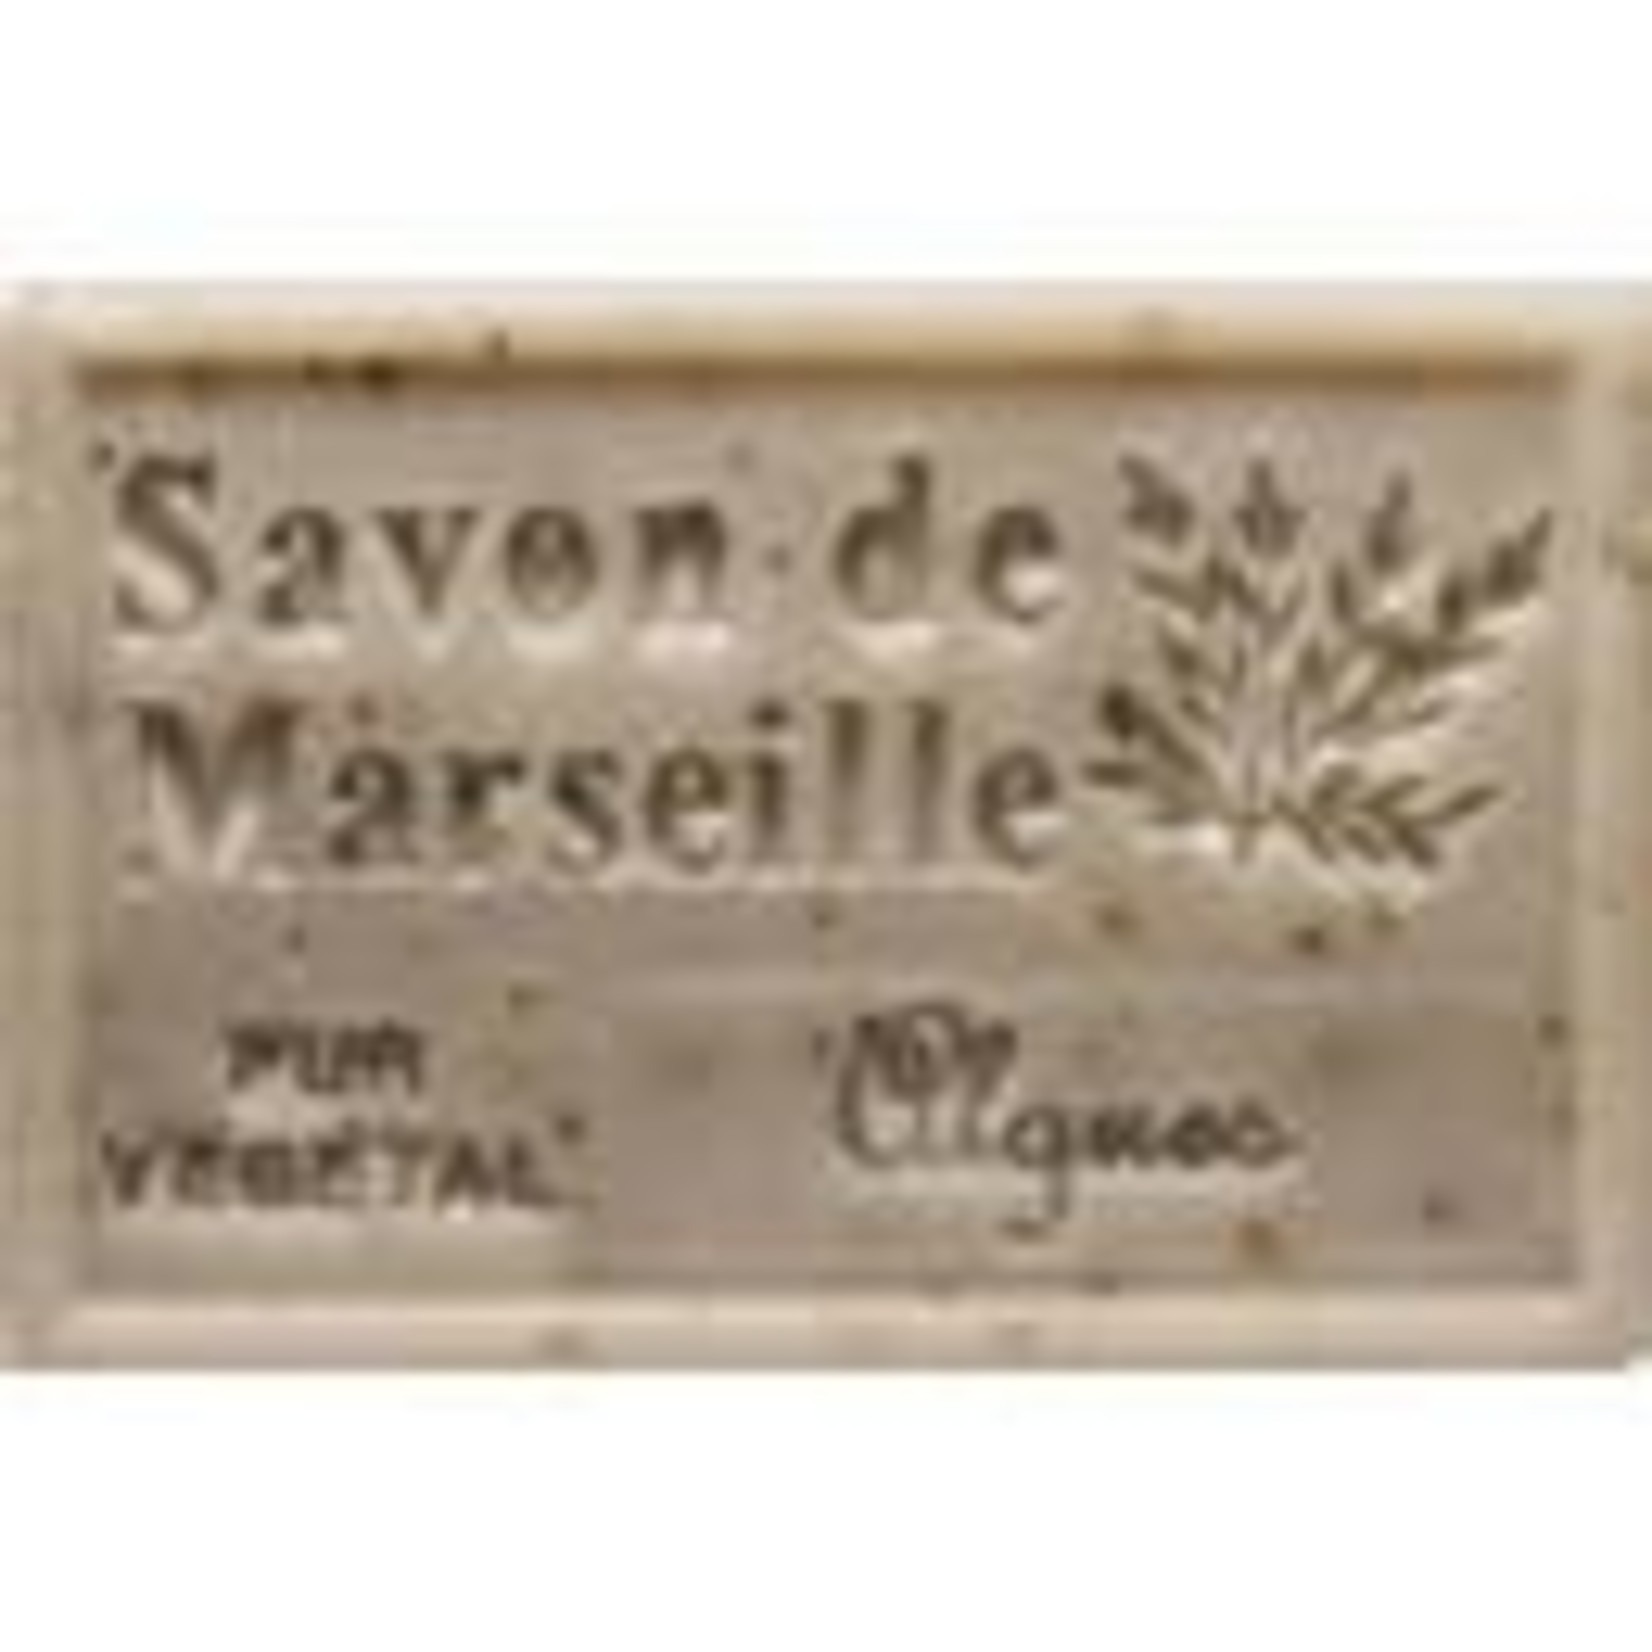 Marseille Soap Company Seaweed   Savon de Marseille   French Soap 4.37 Oz